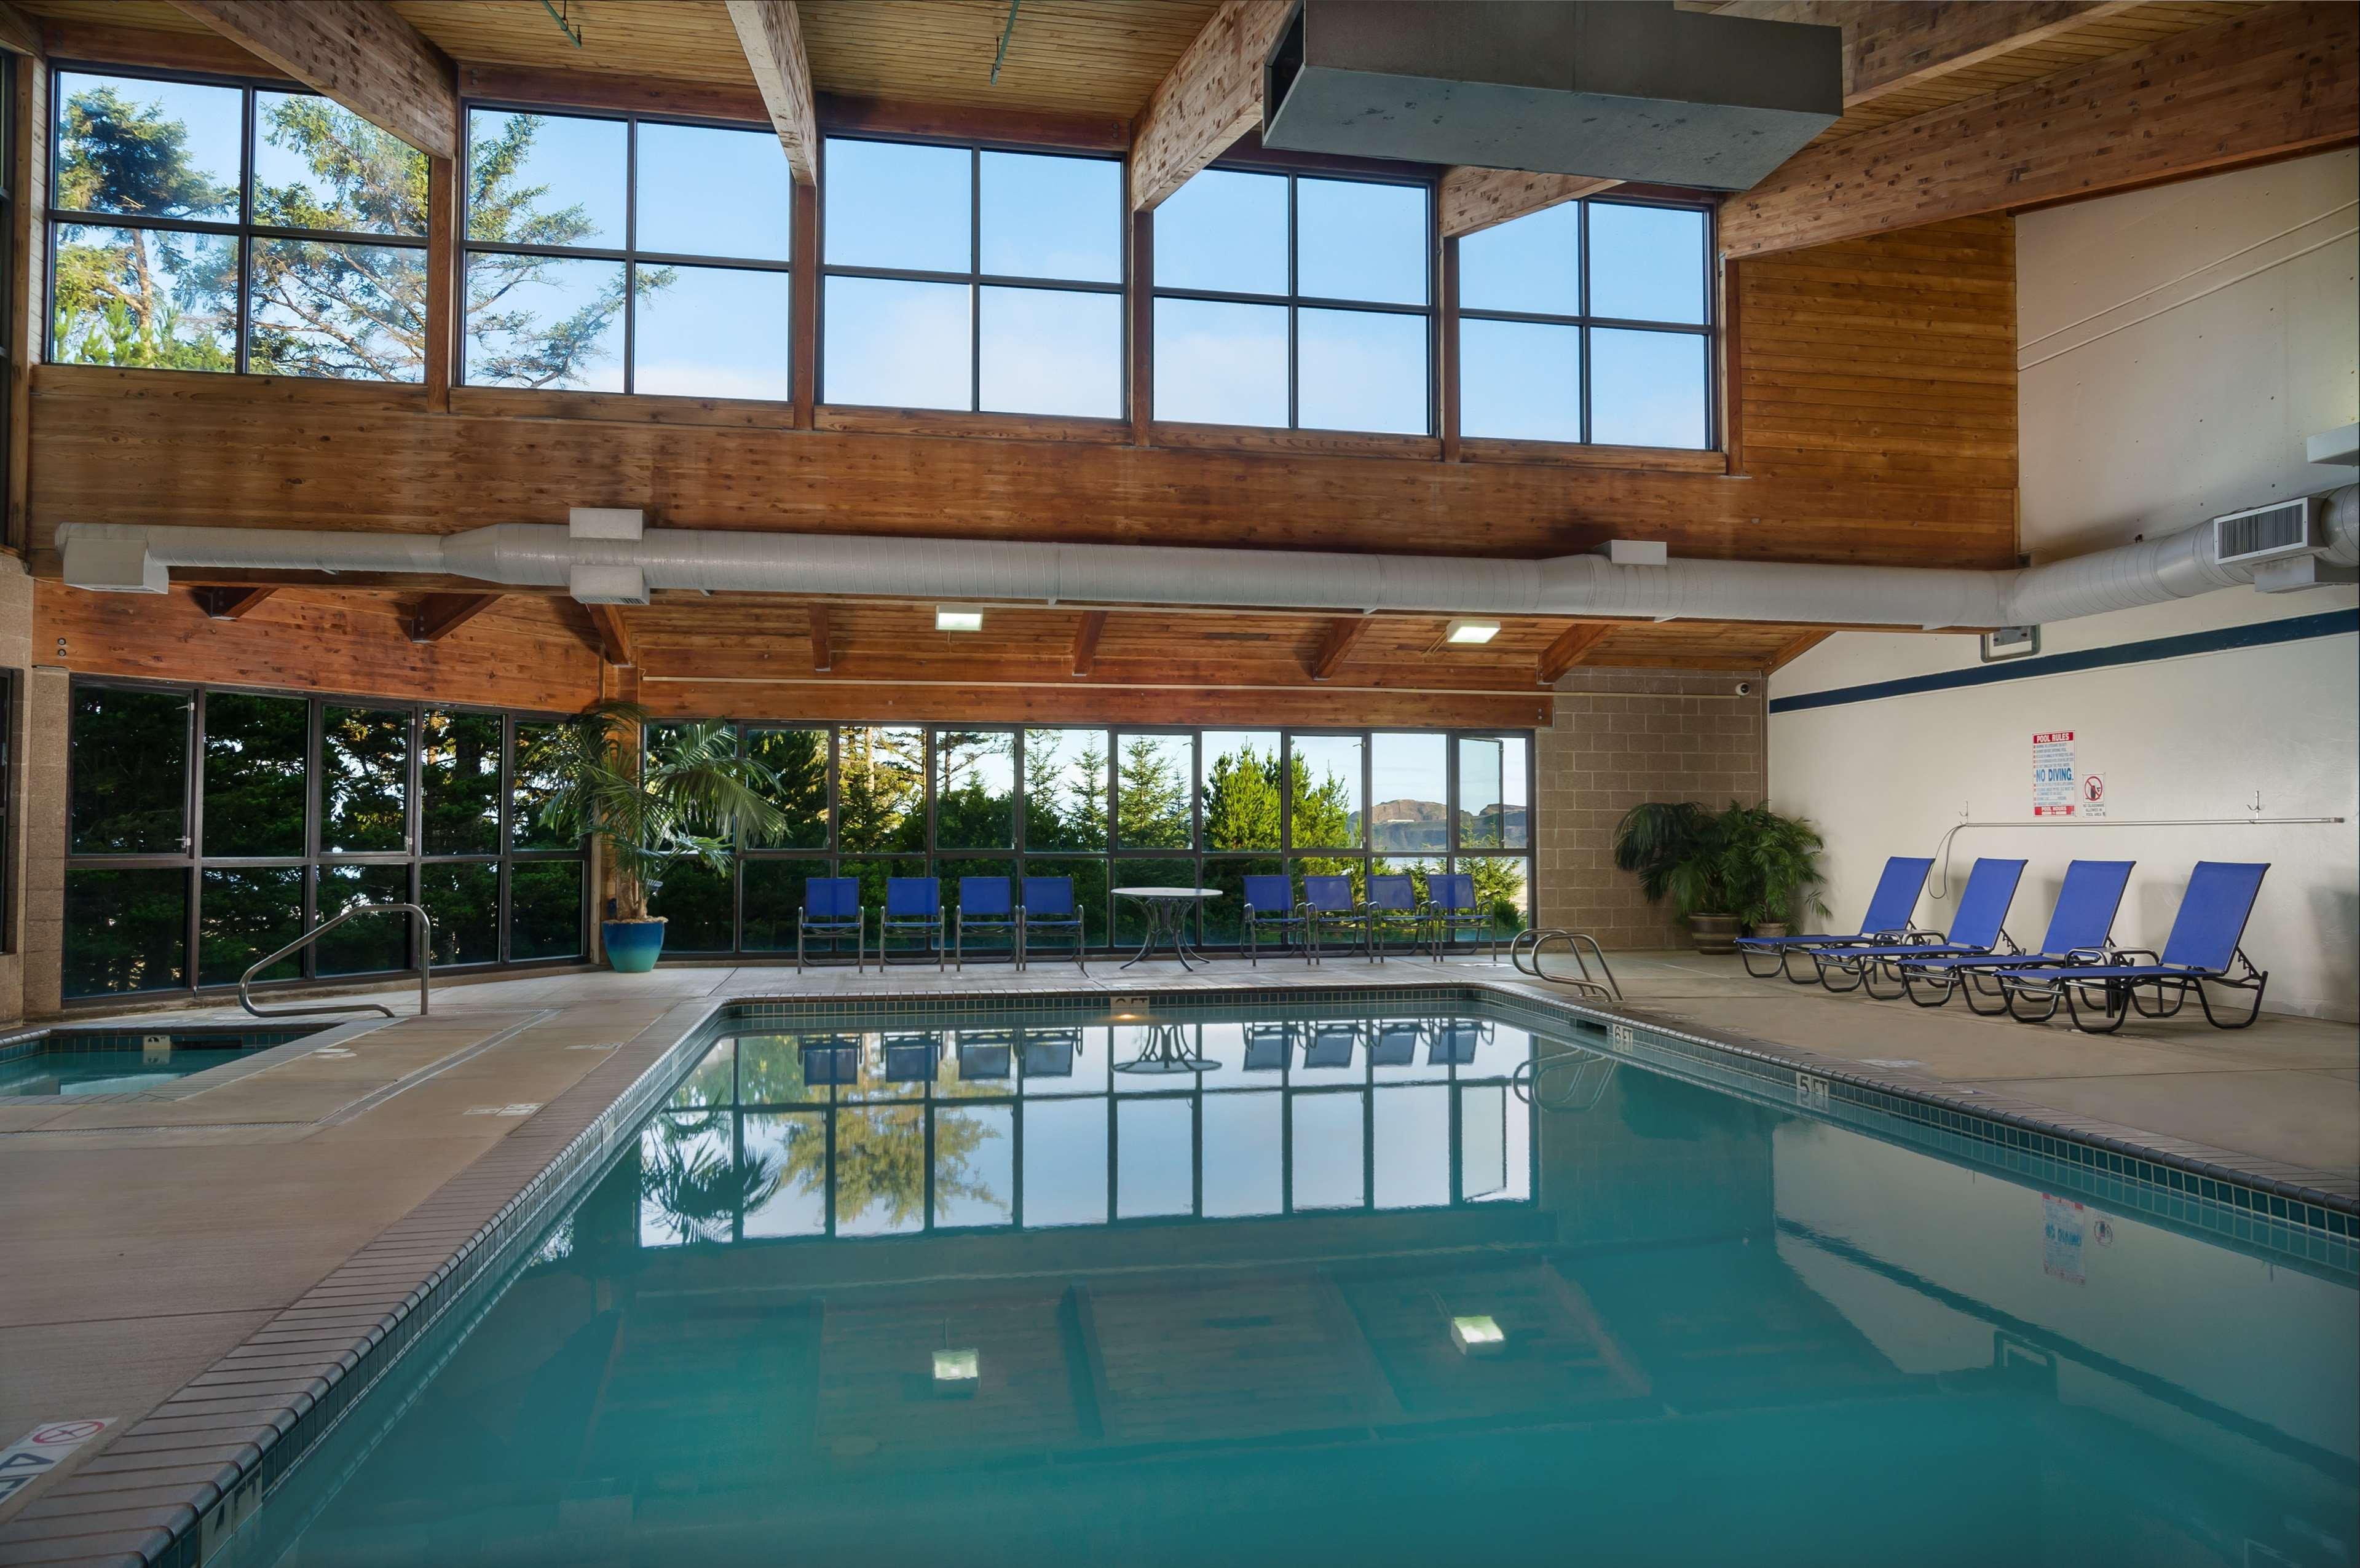 Best Western Agate Beach Inn image 8